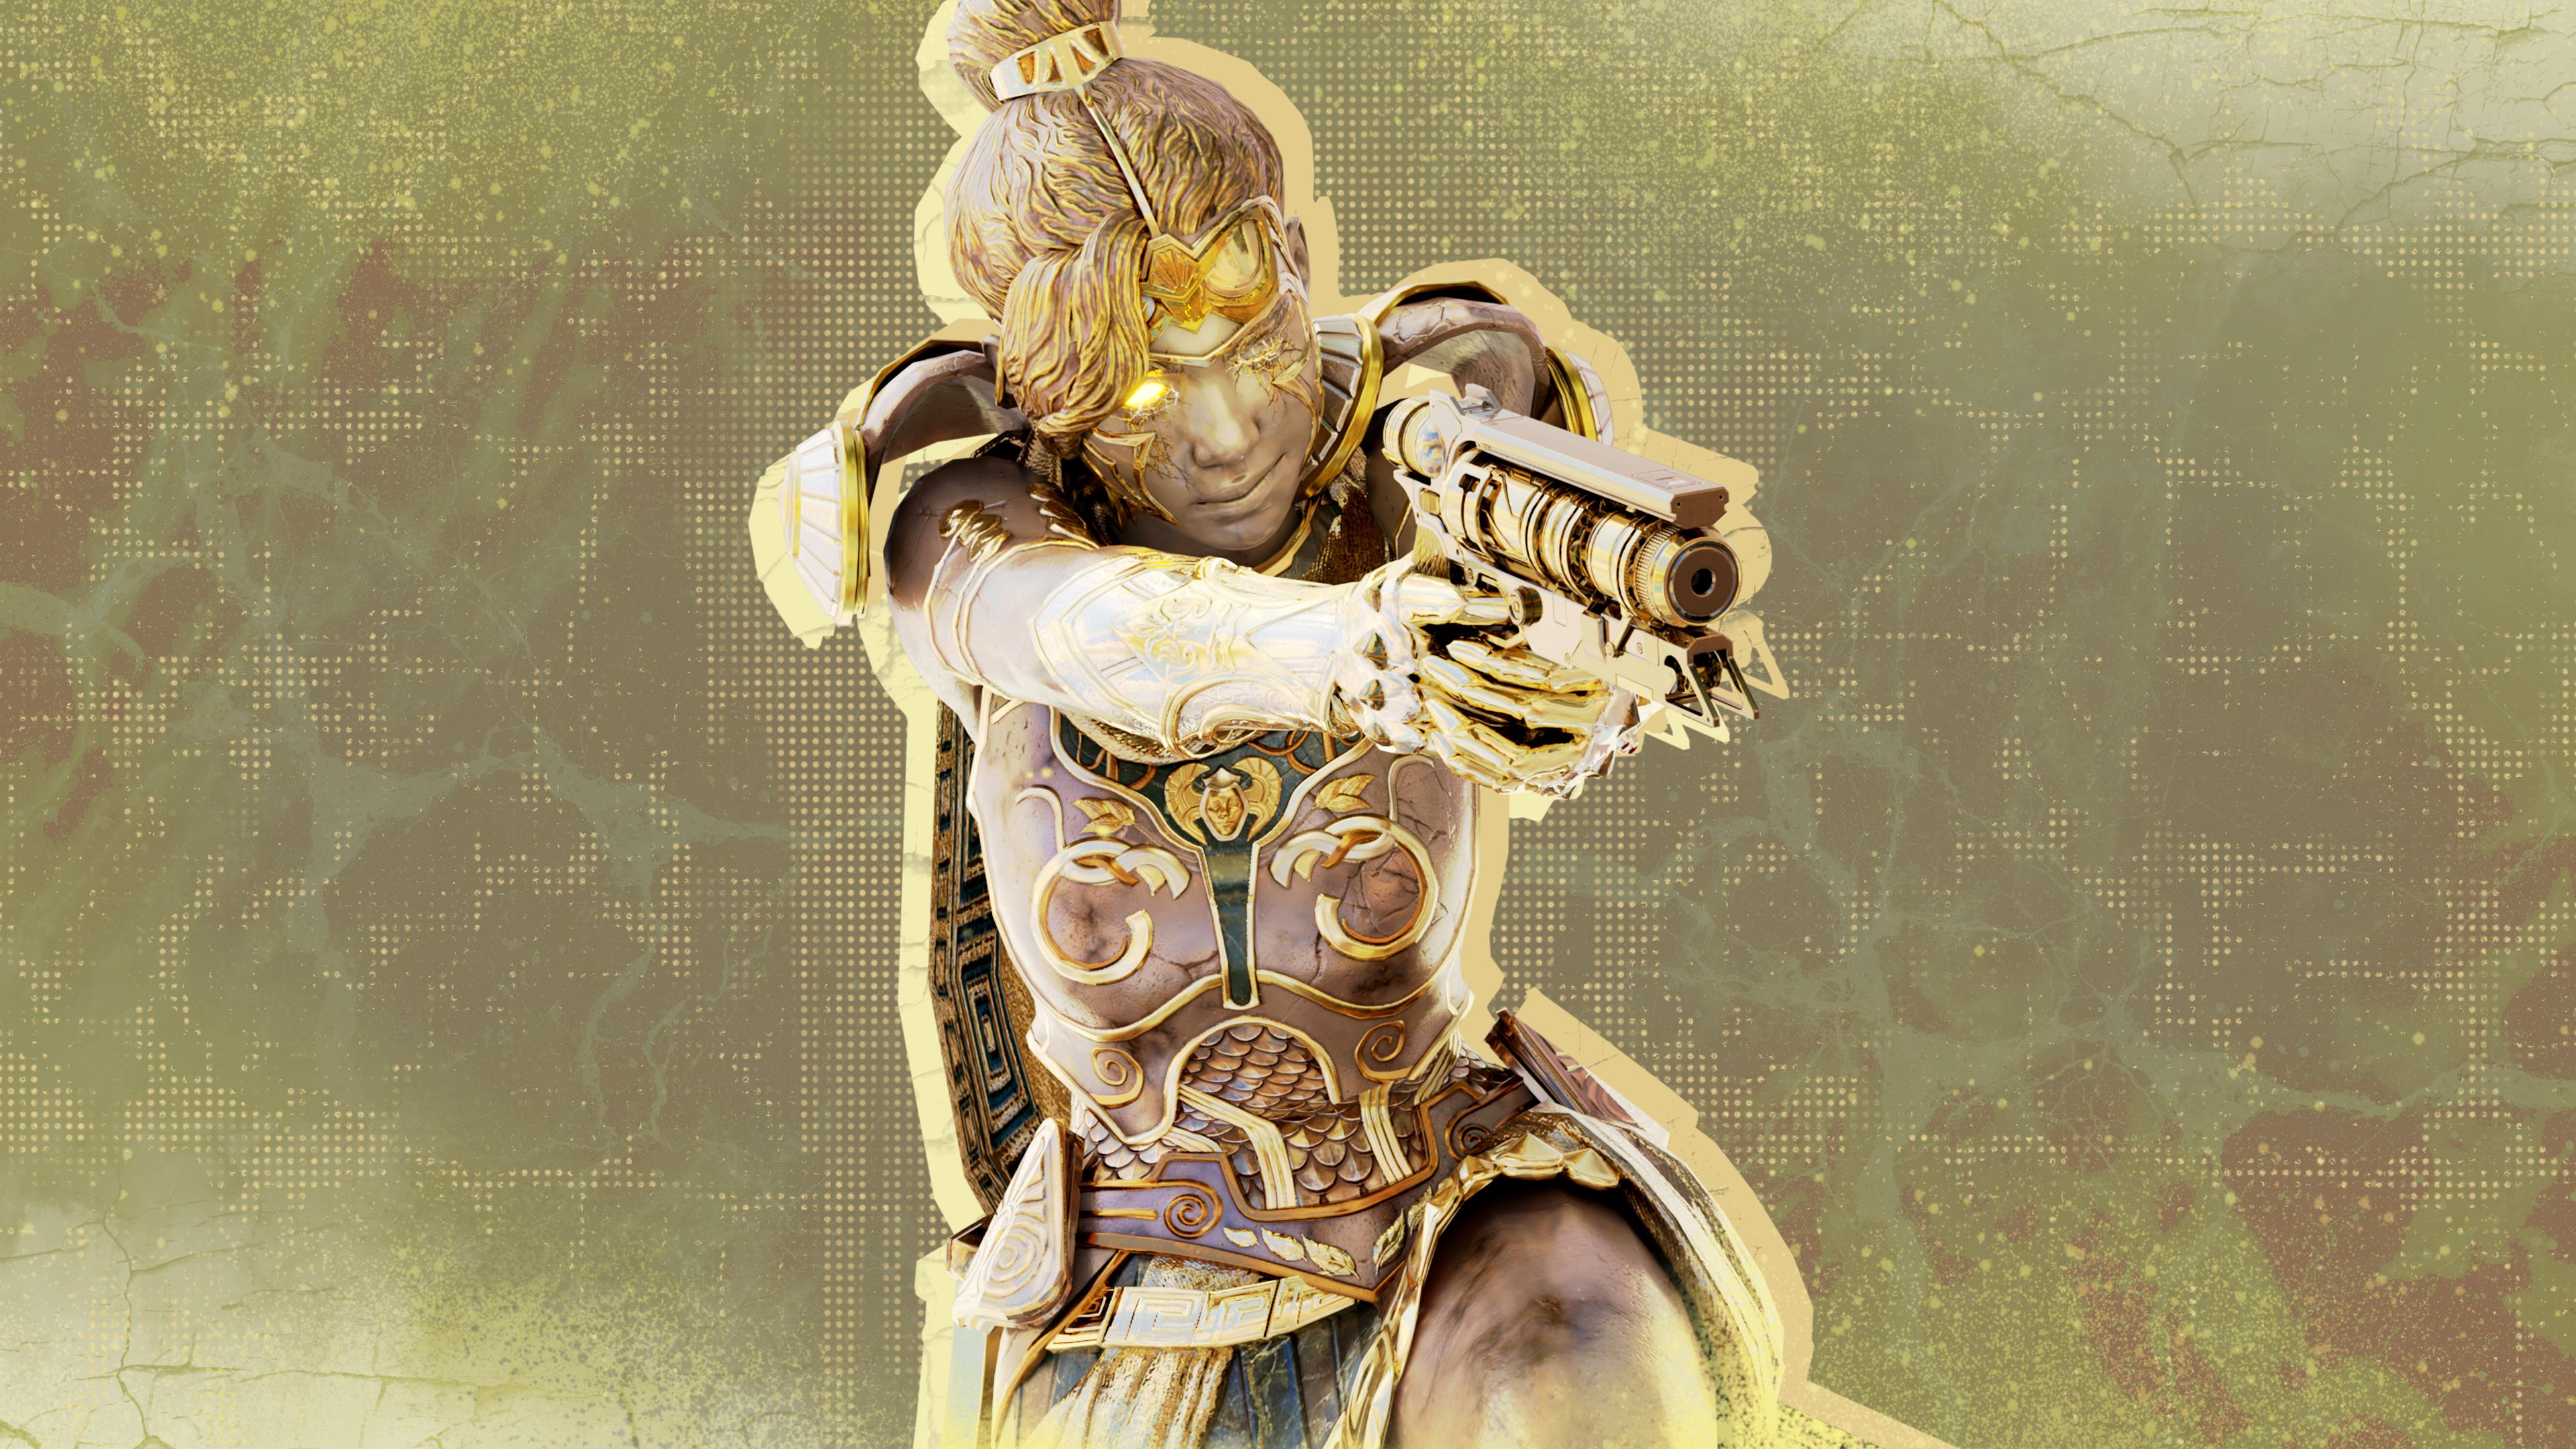 General 3840x2160 Wraith (Apex Legends) Apex Legends video game art video game characters video game girls Girl With Weapon 3D graphics Blender pistol